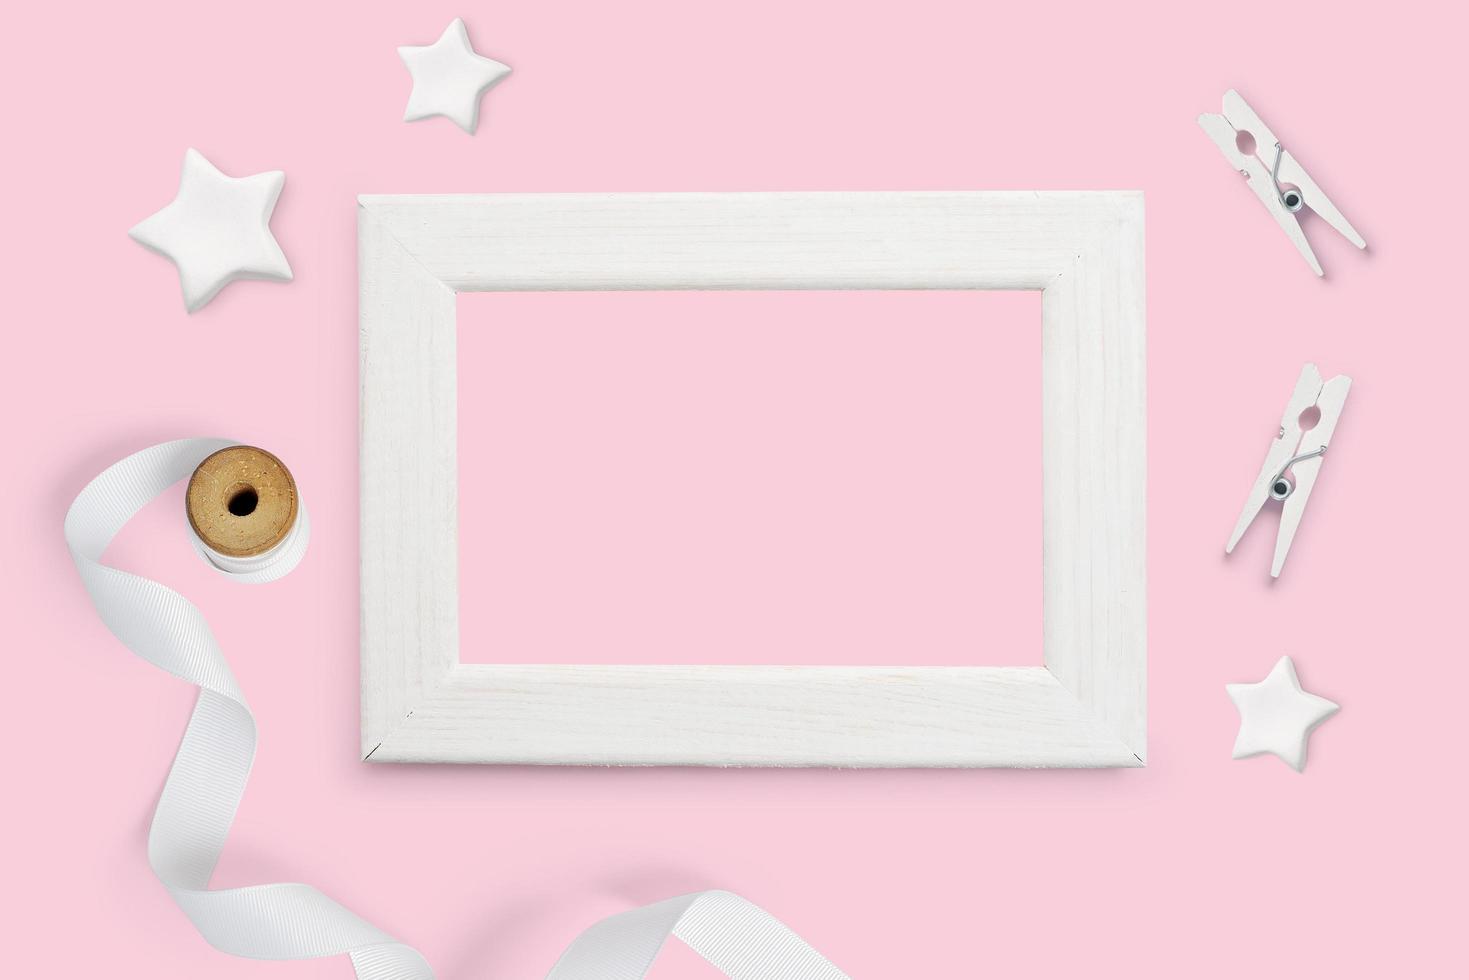 mockup van wit houten frame, witte sterren, lint en wasknijpers foto